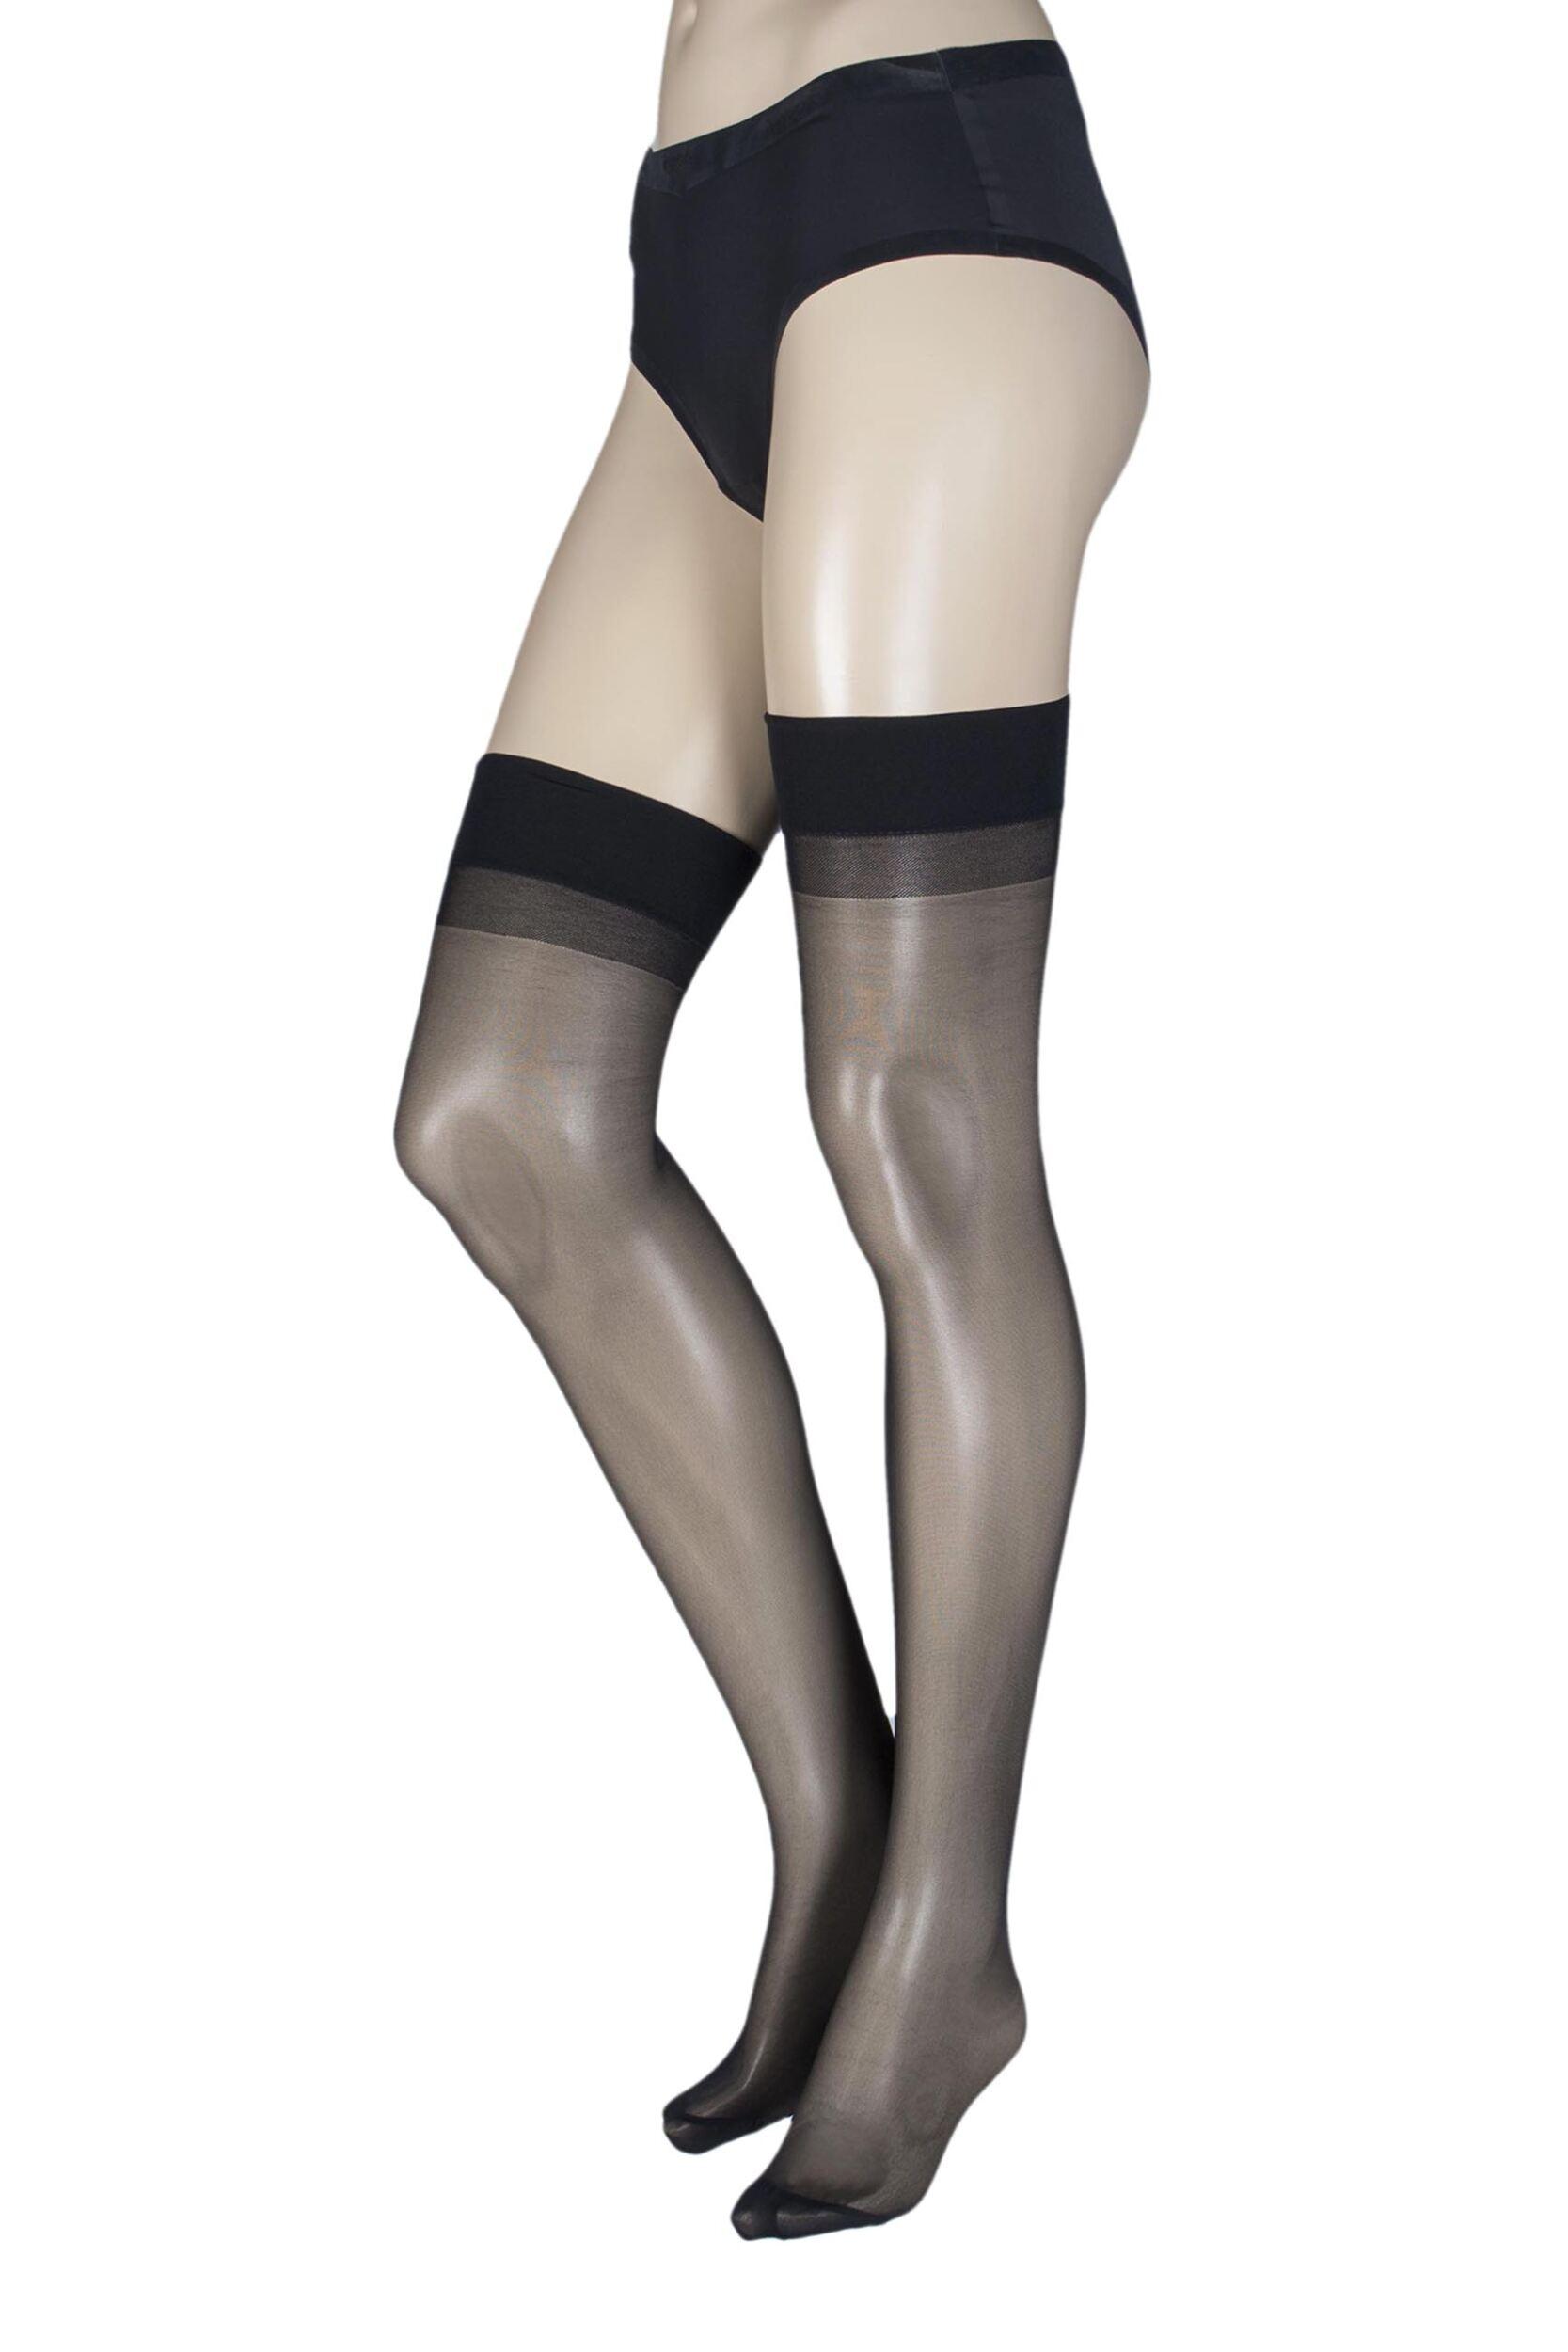 c5f6af5c0cd Trasparenze Womens Sara All Sheer Stockings Trasparenze Hosiery ...